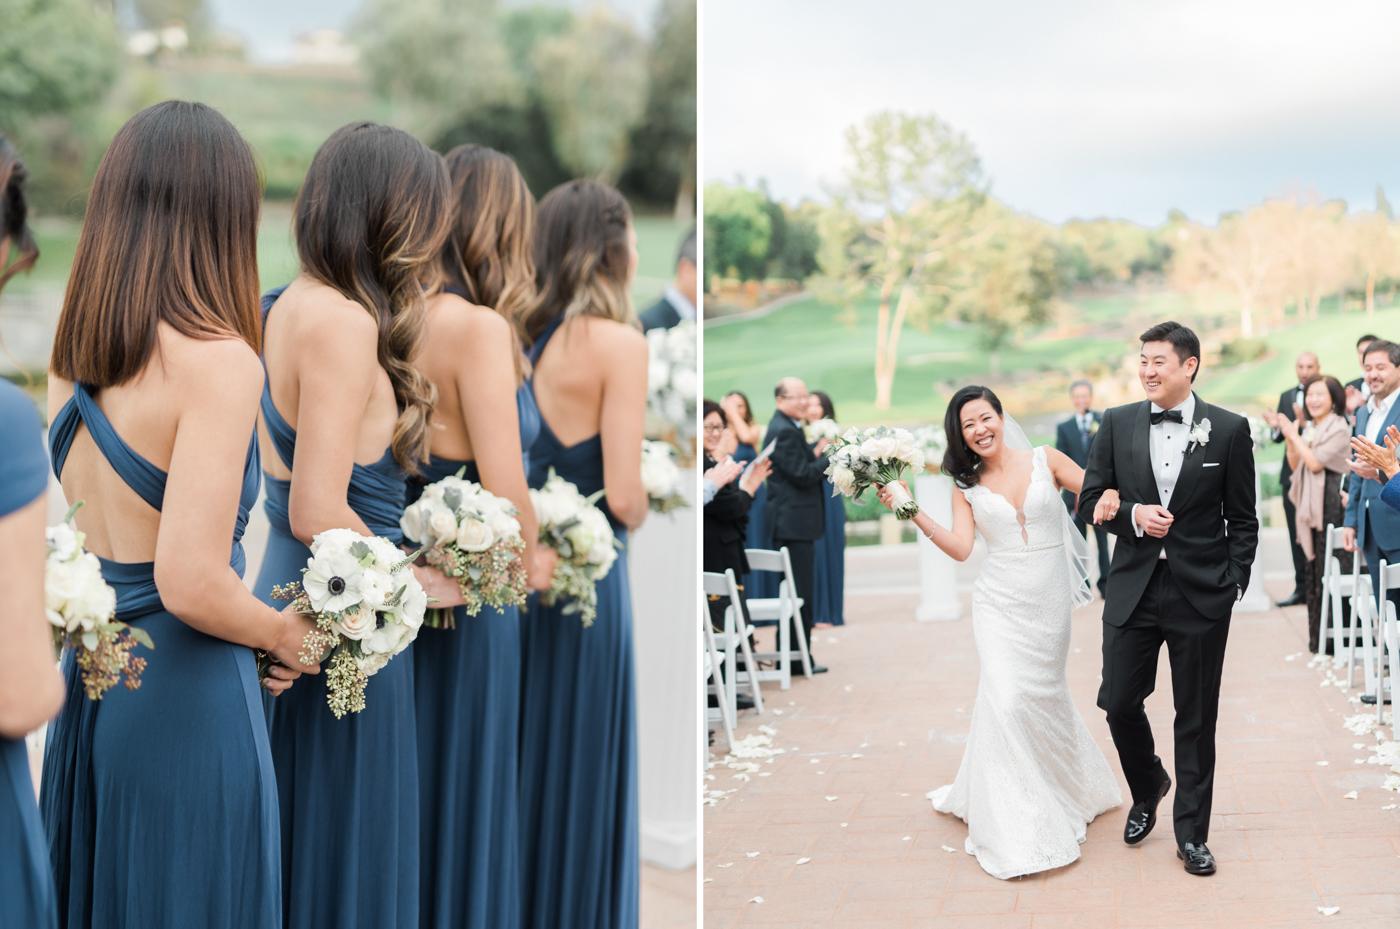 Friendly_Hills_Country_Club_fine_art_wedding_photographer_los_angeles_paris-35.jpg